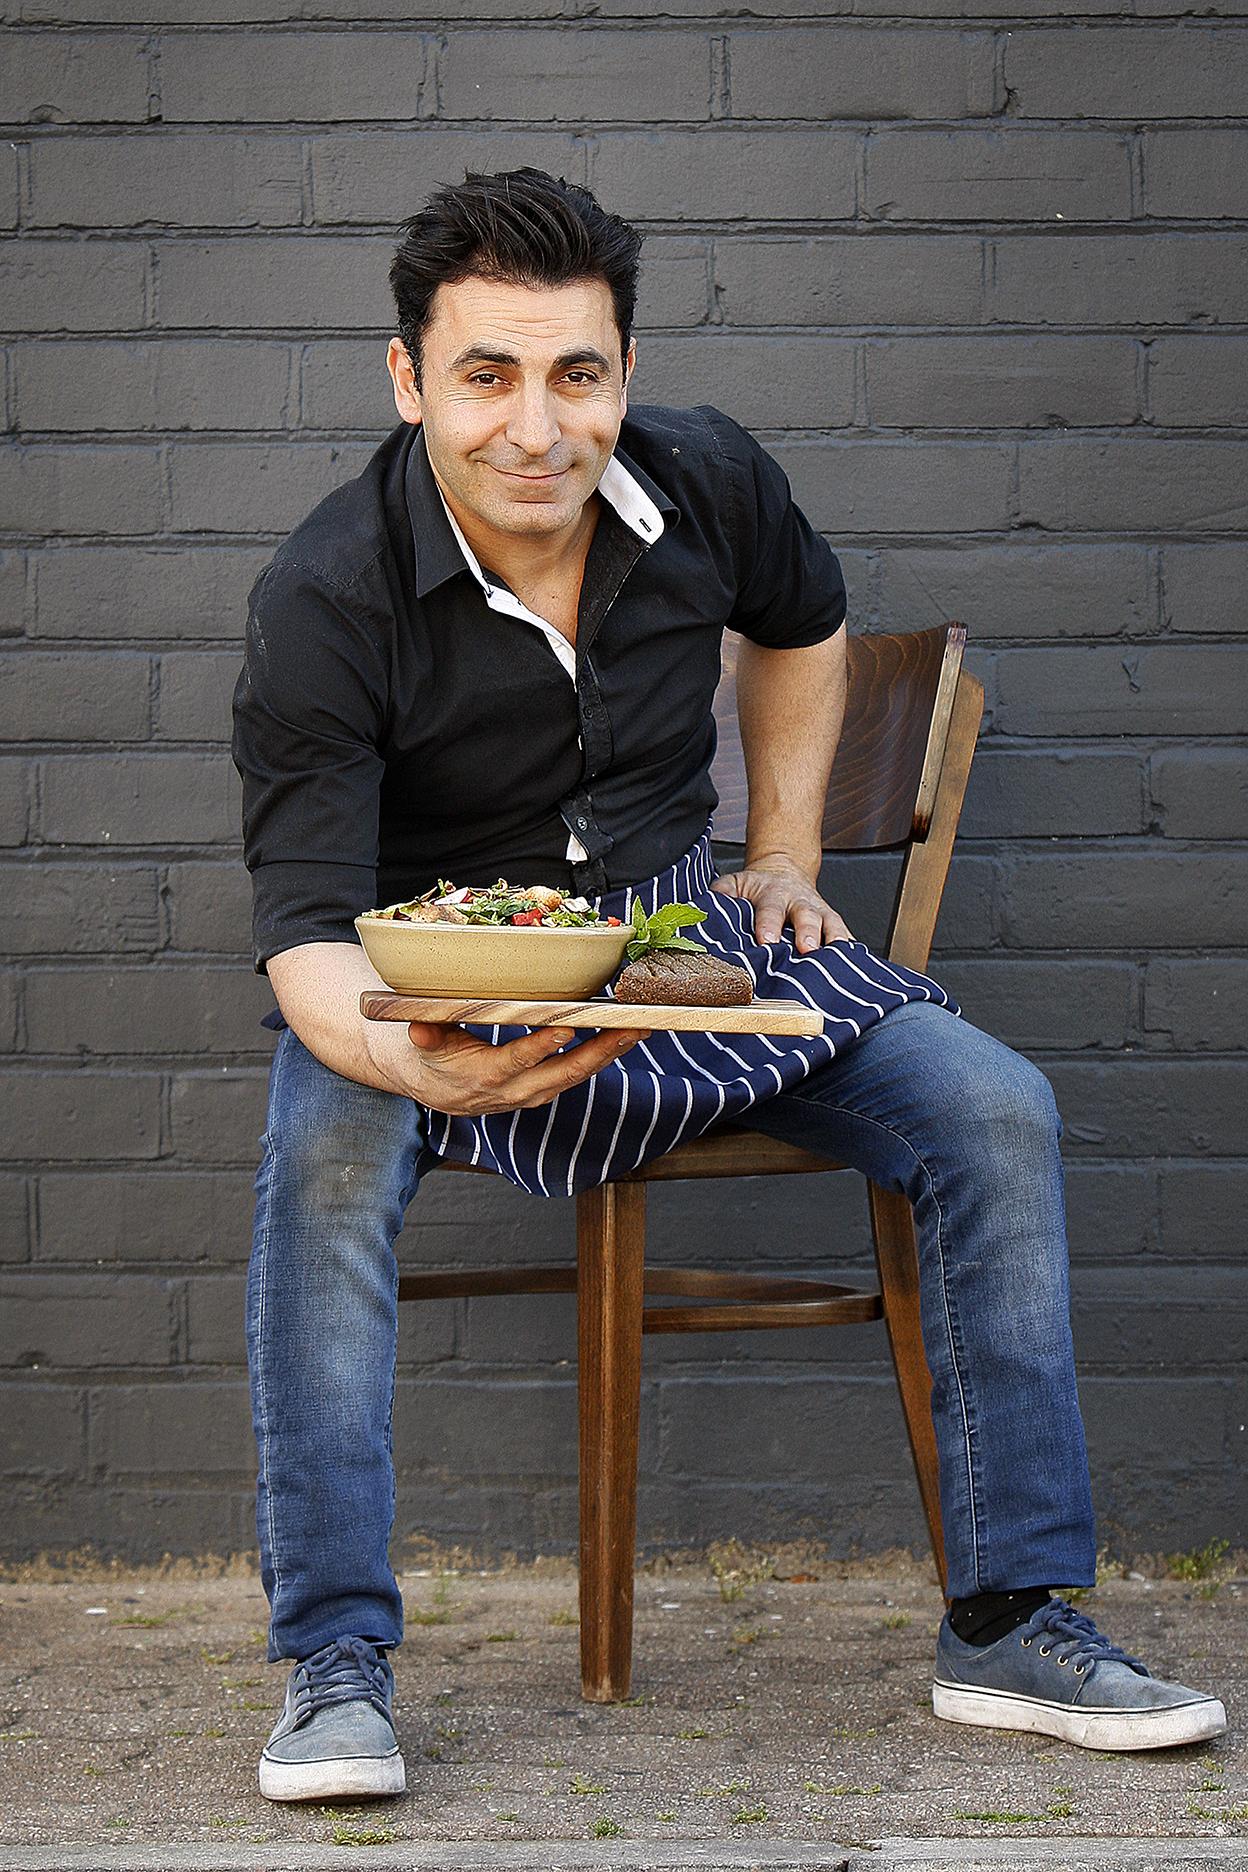 CHP_Export_126302547_Ballaboosta owner Naj Moubayed with some %27Kebbi%27 %26   %27Fattoush%27 salad at his Ad.jpg